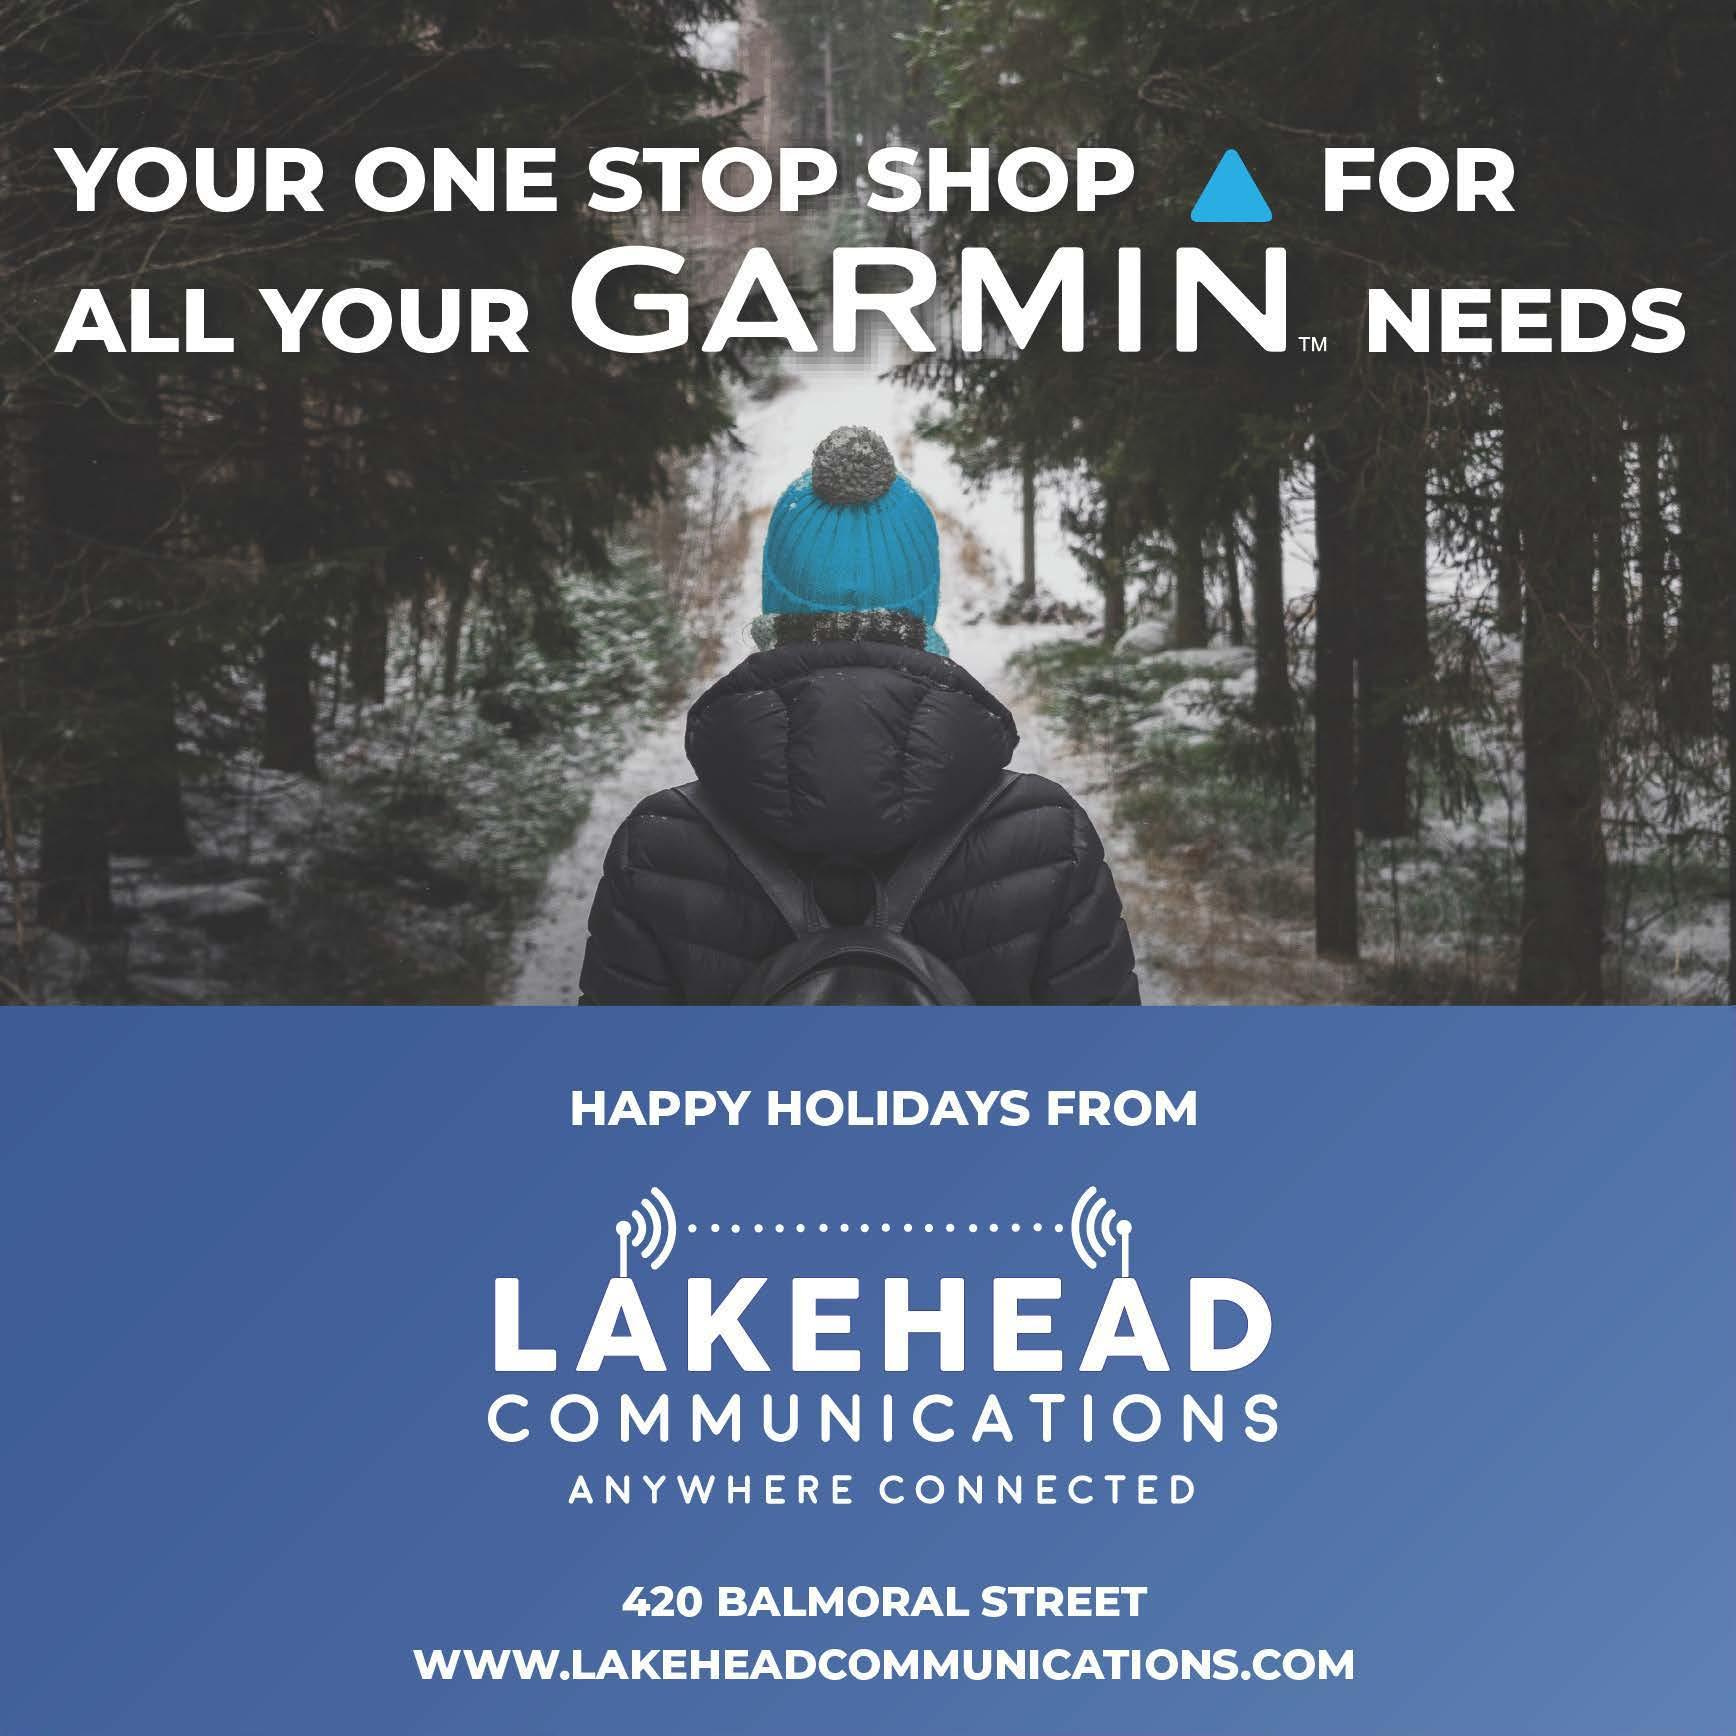 Lakehead Communications